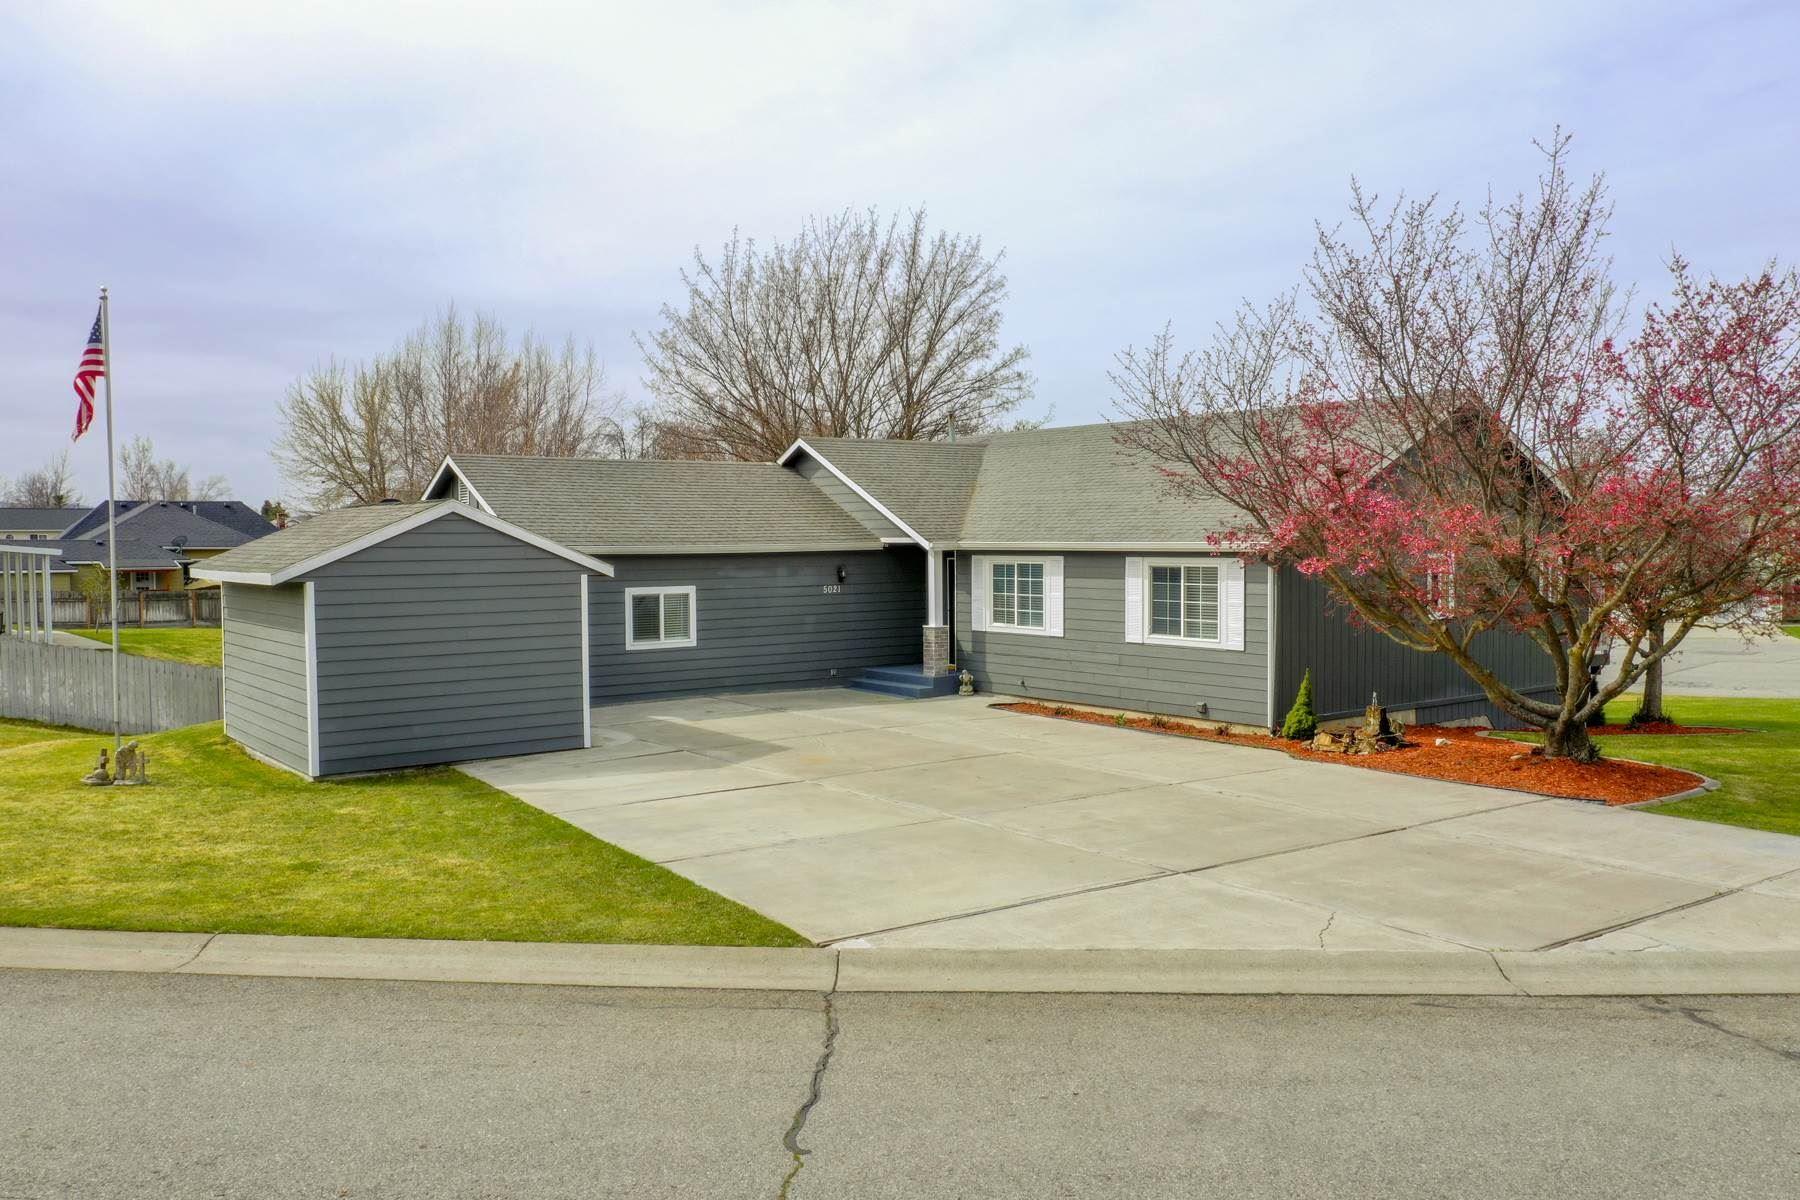 5021 N Sunnyvale Dr, Spokane Valley, WA 99216 - #: 202113706